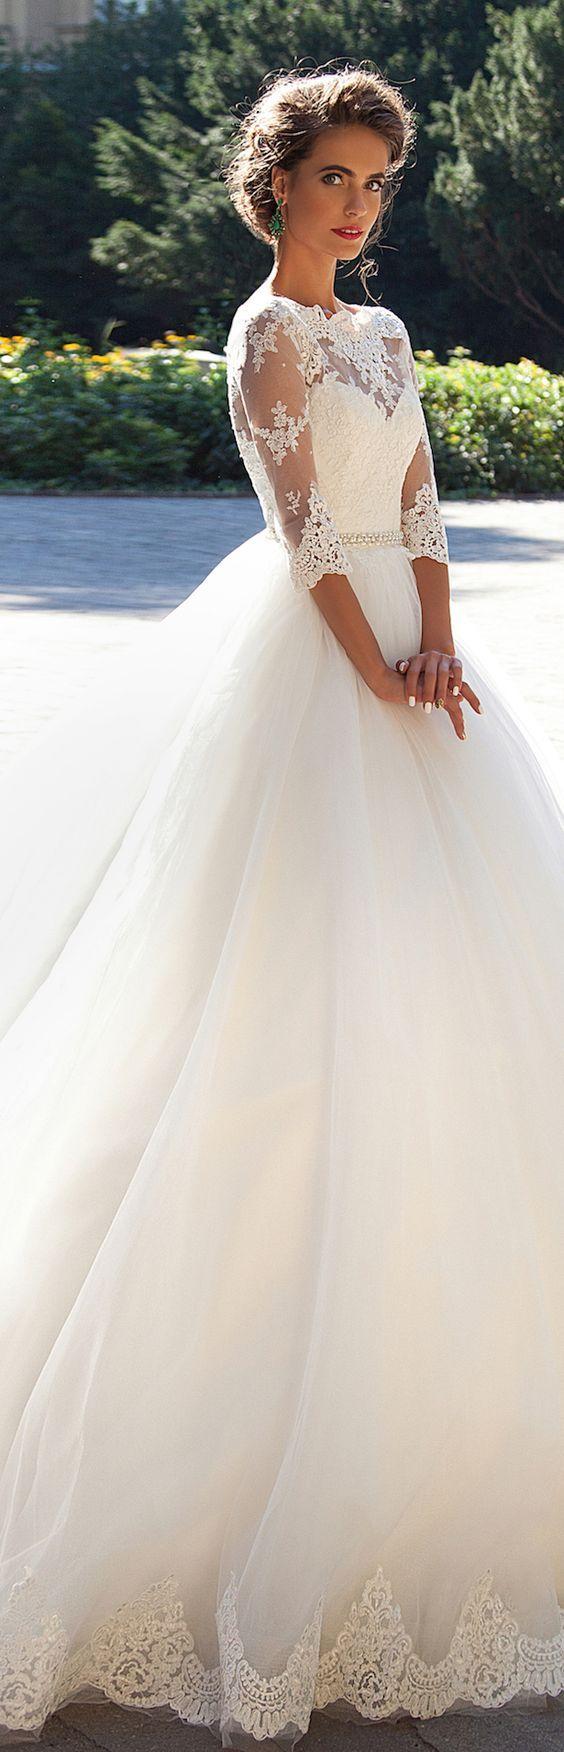 Fabulous  Stunning Long Sleeve Wedding Dresses